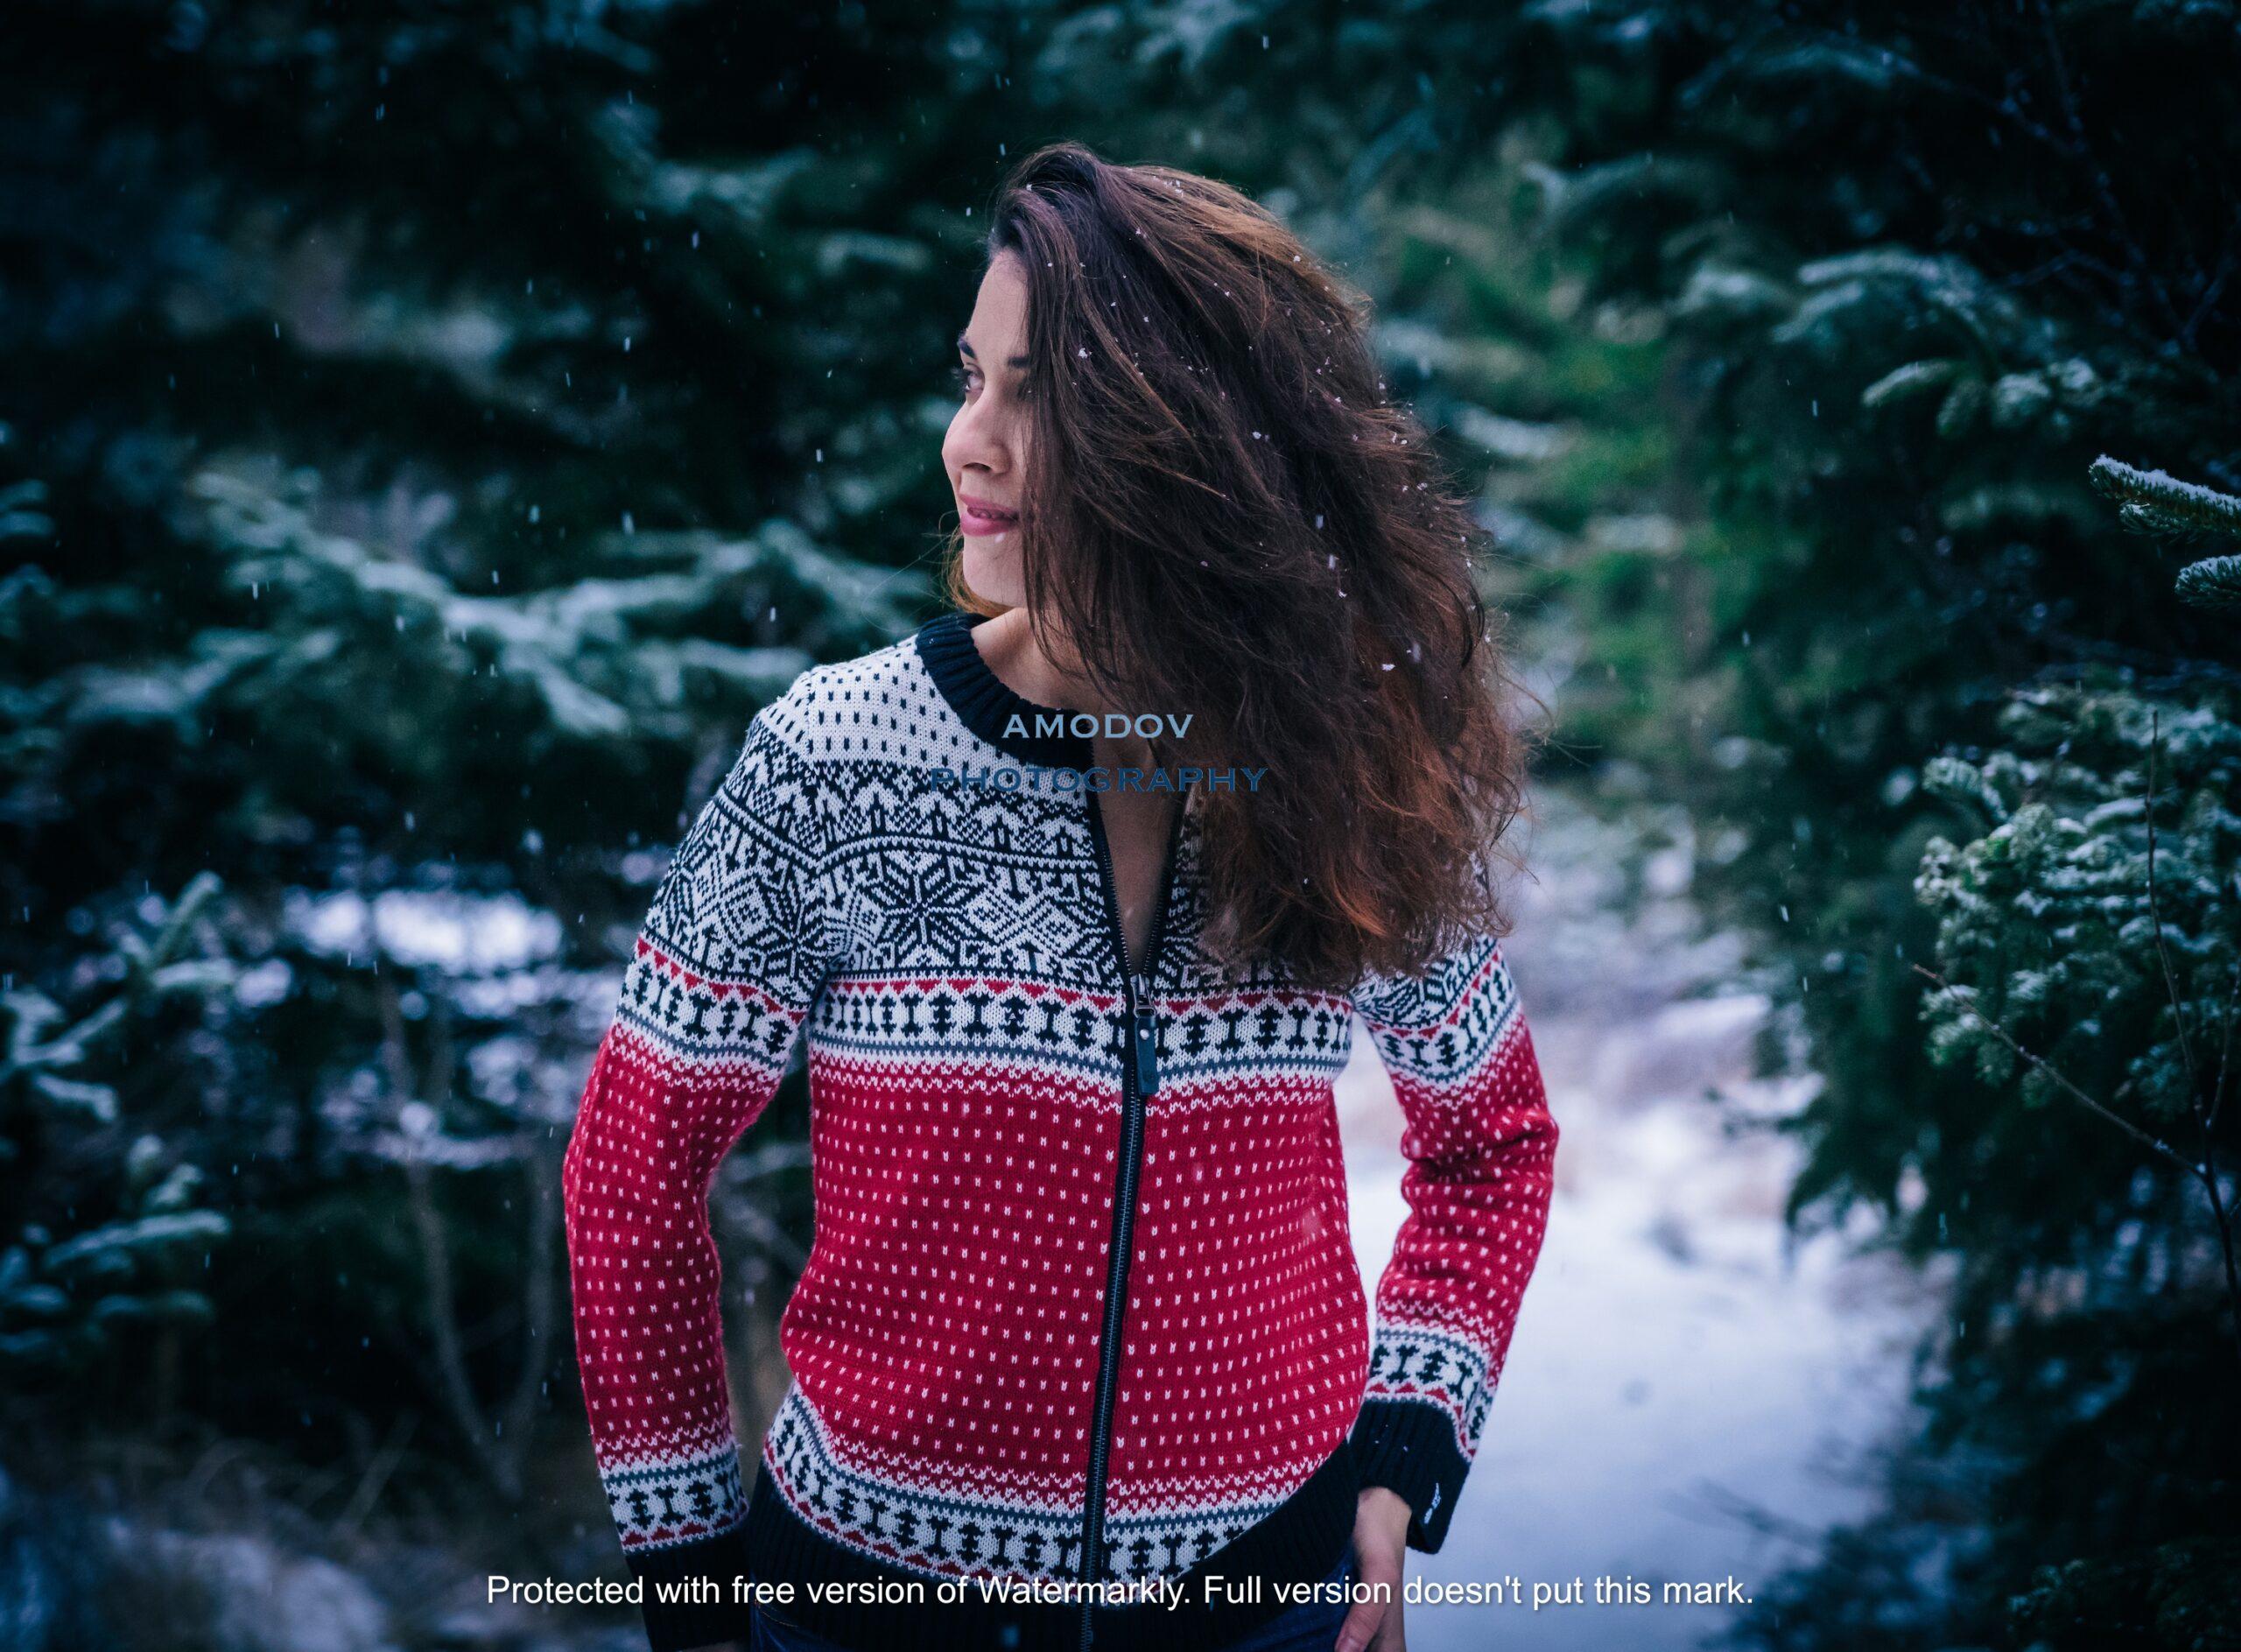 Outdoor & portrait photo shoot